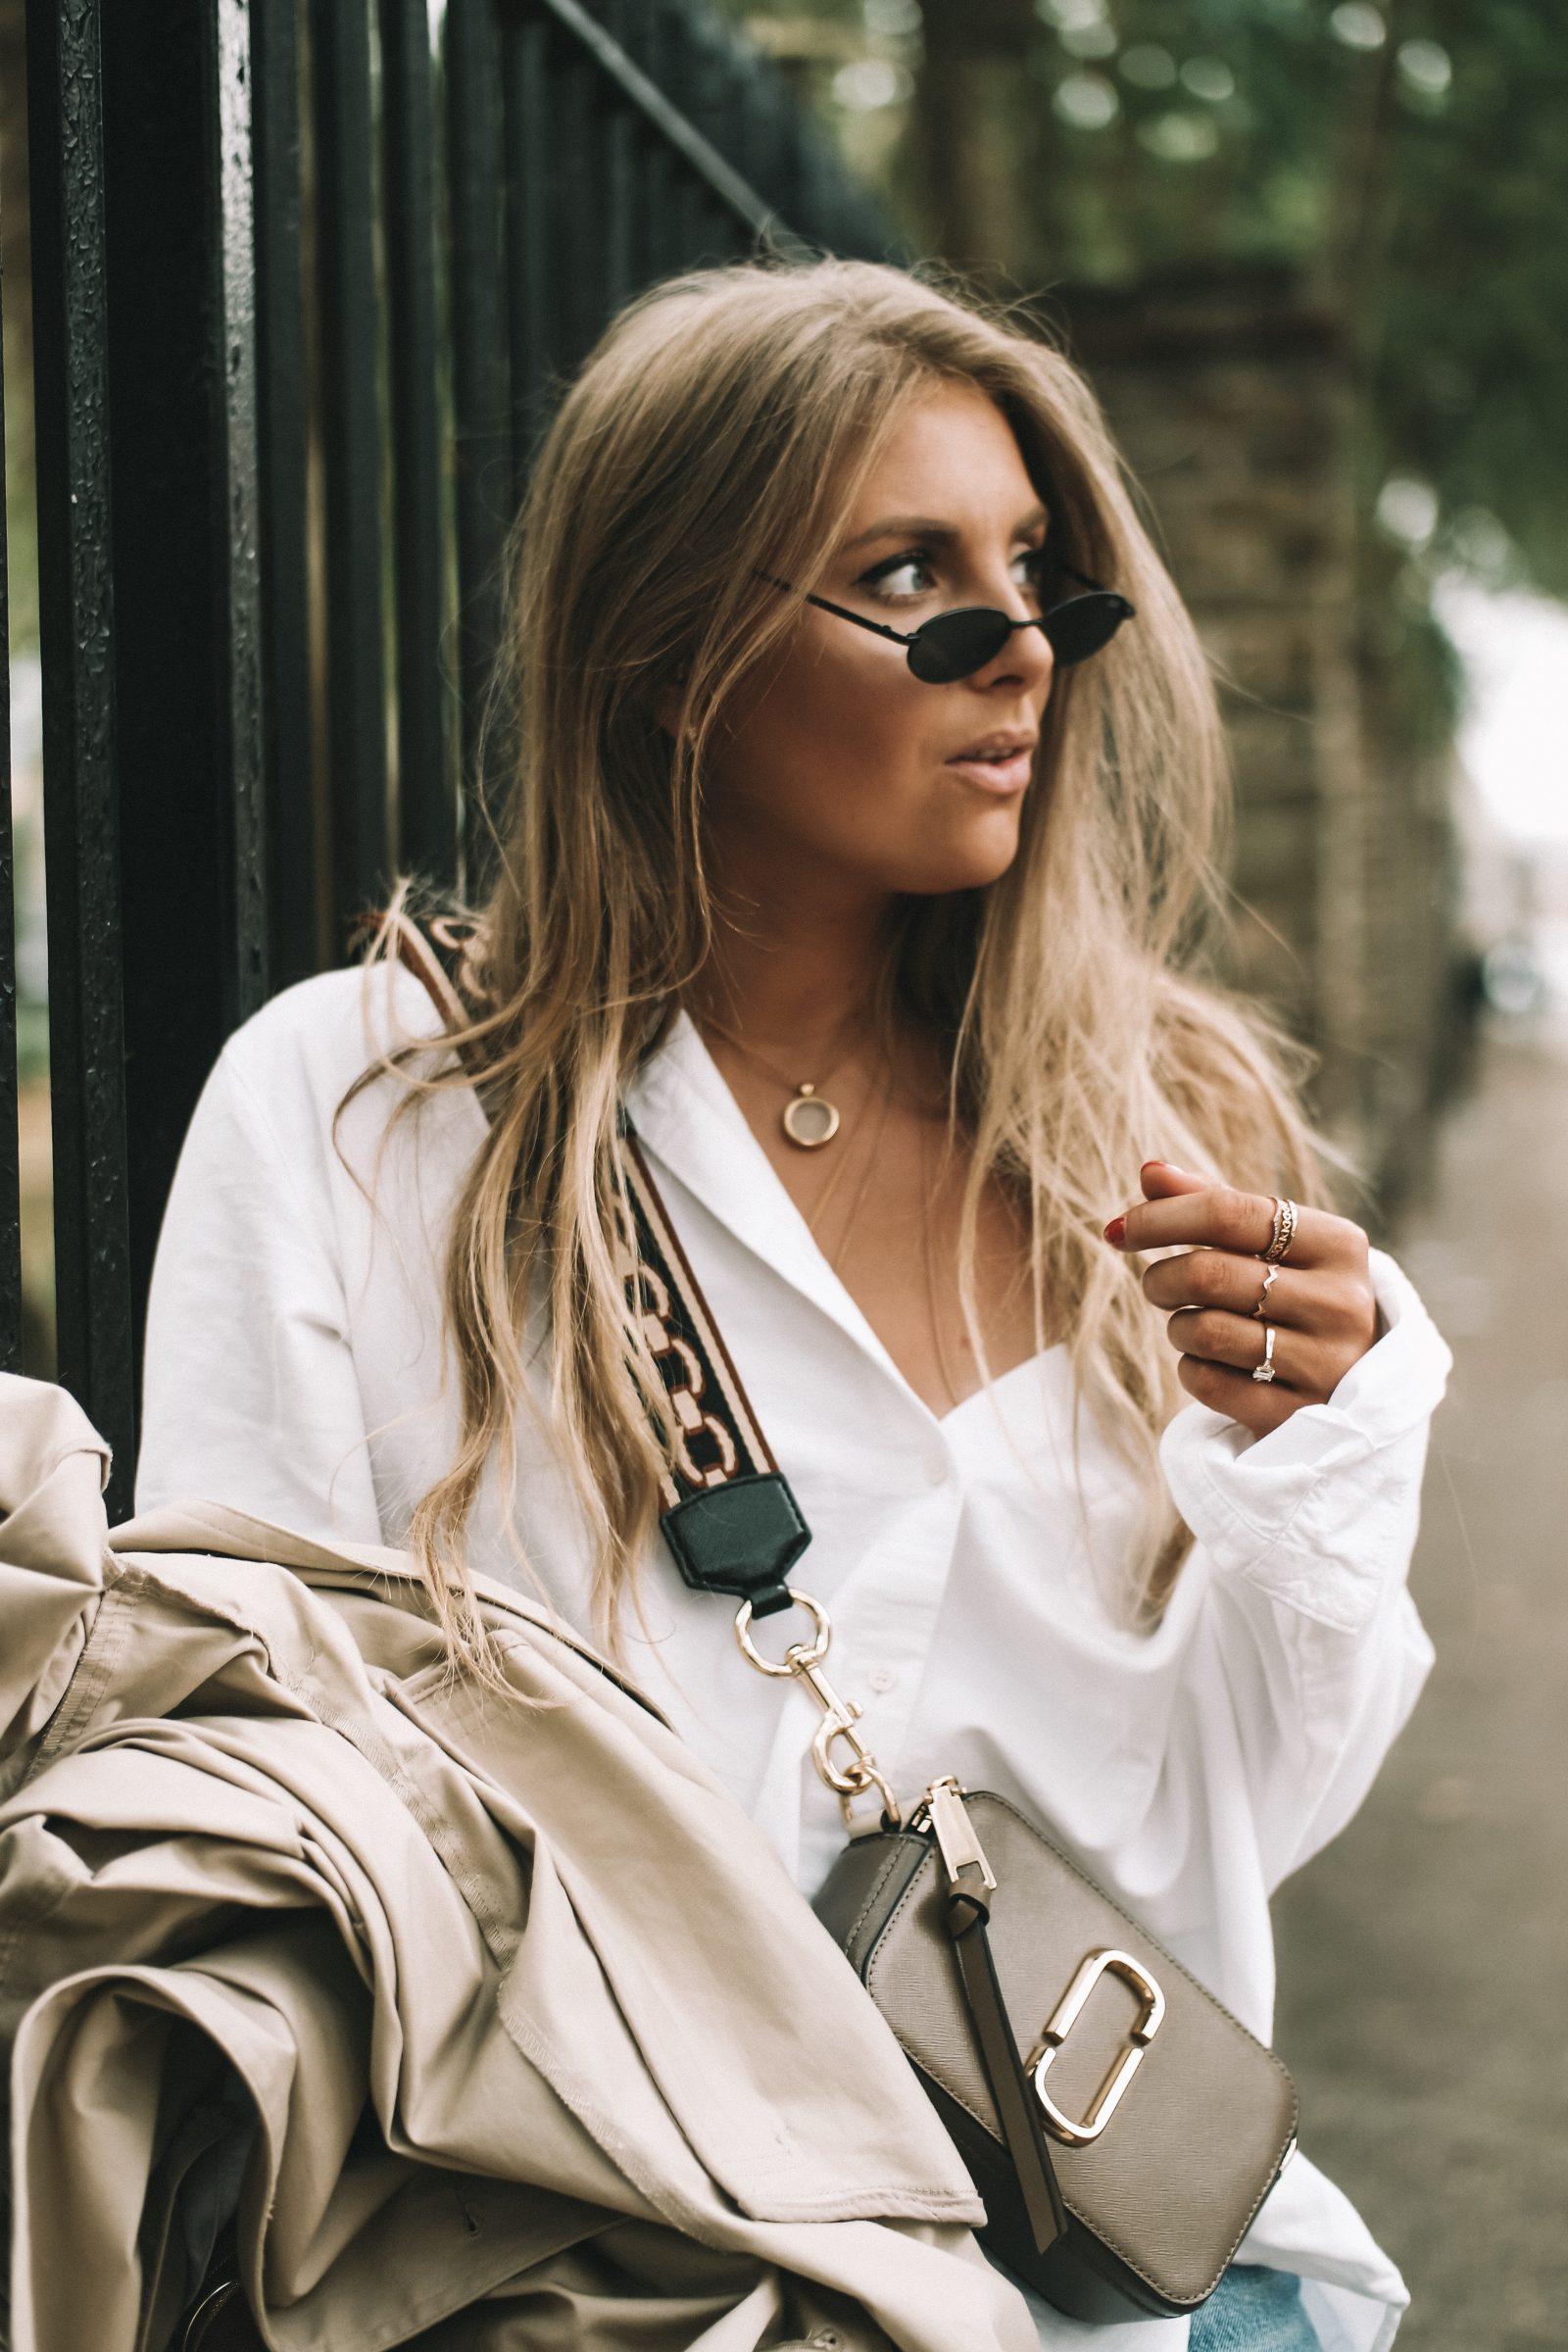 LFW Street Style - Marc Jacobs Bag